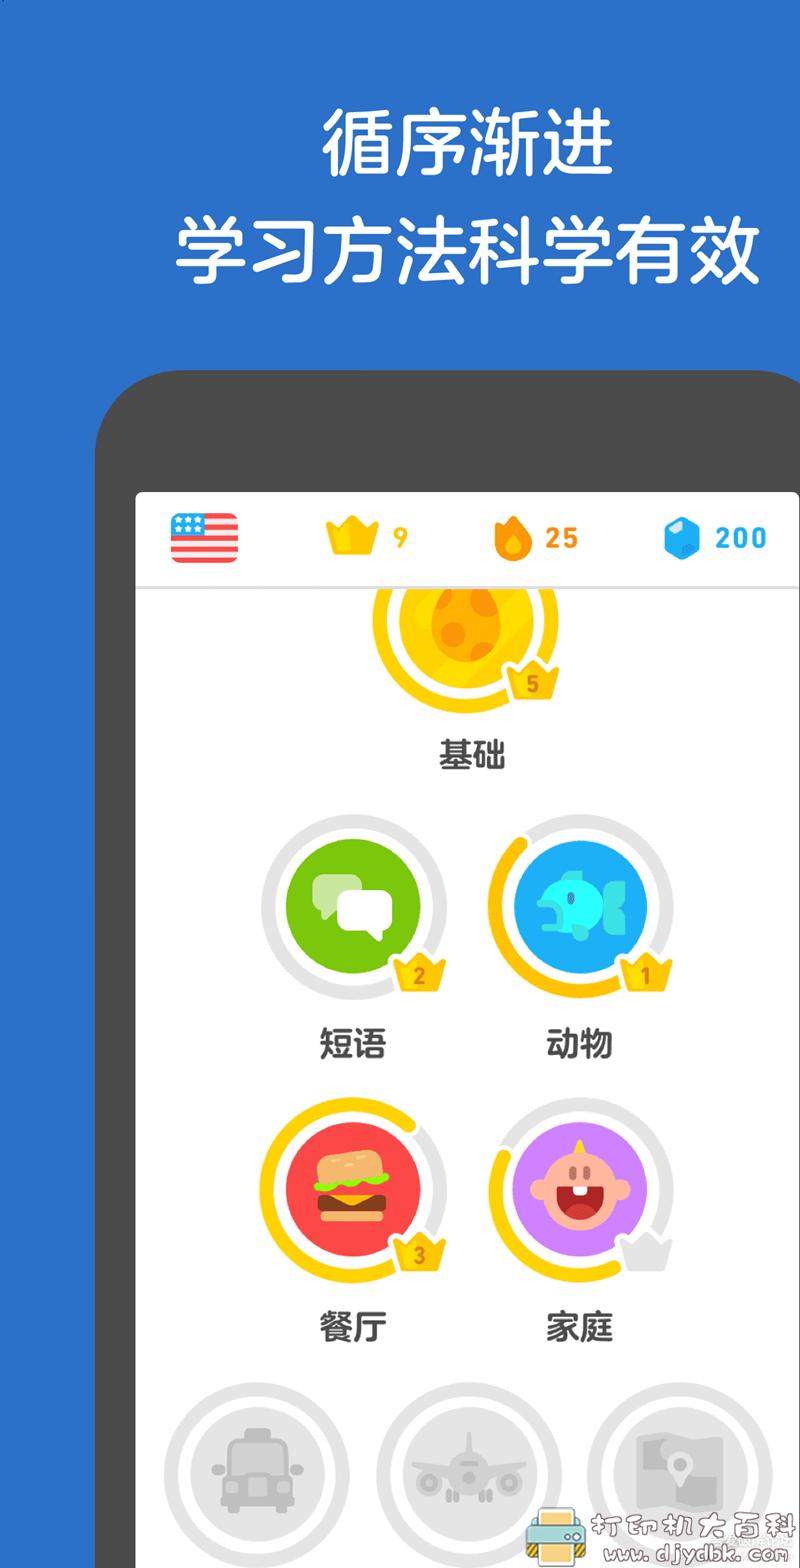 [Android]多邻国语言学习 v4.71.0 直装解锁付费版 配图